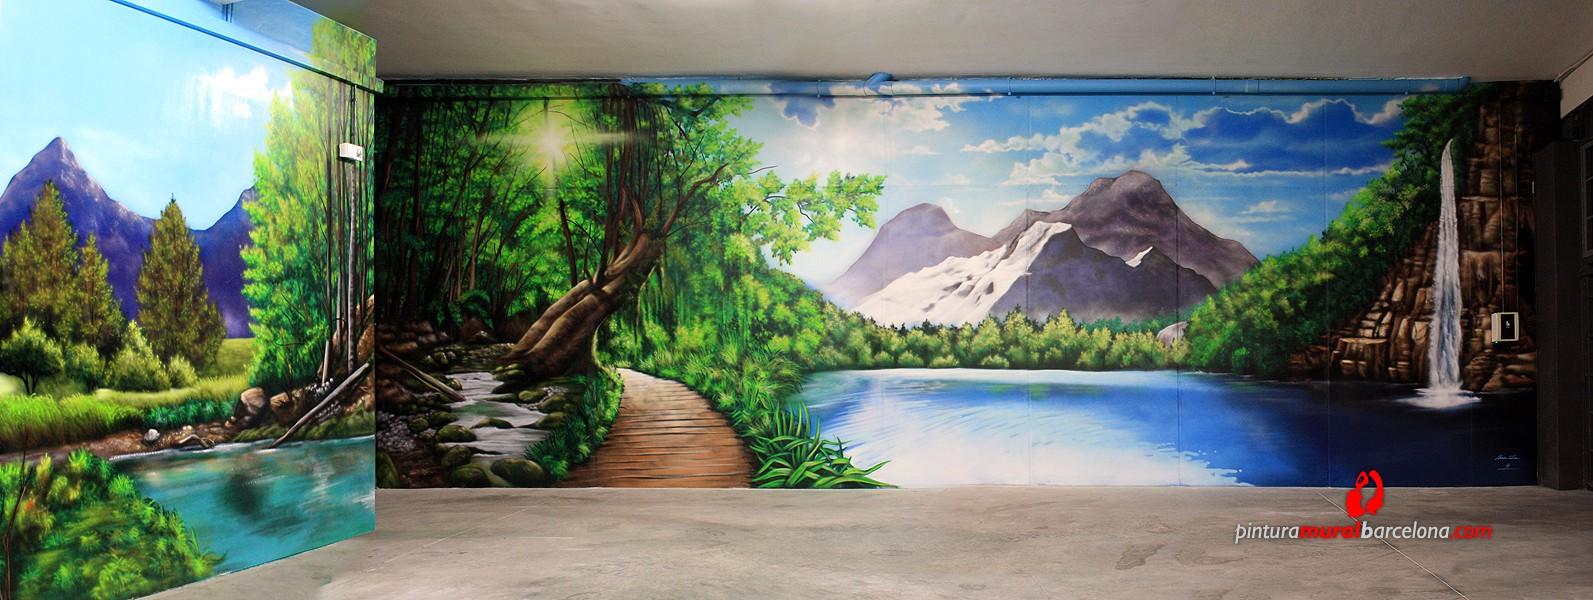 Paisaje 3d mural bosque pintura mural barcelona mateo for Murales en 3d para salas